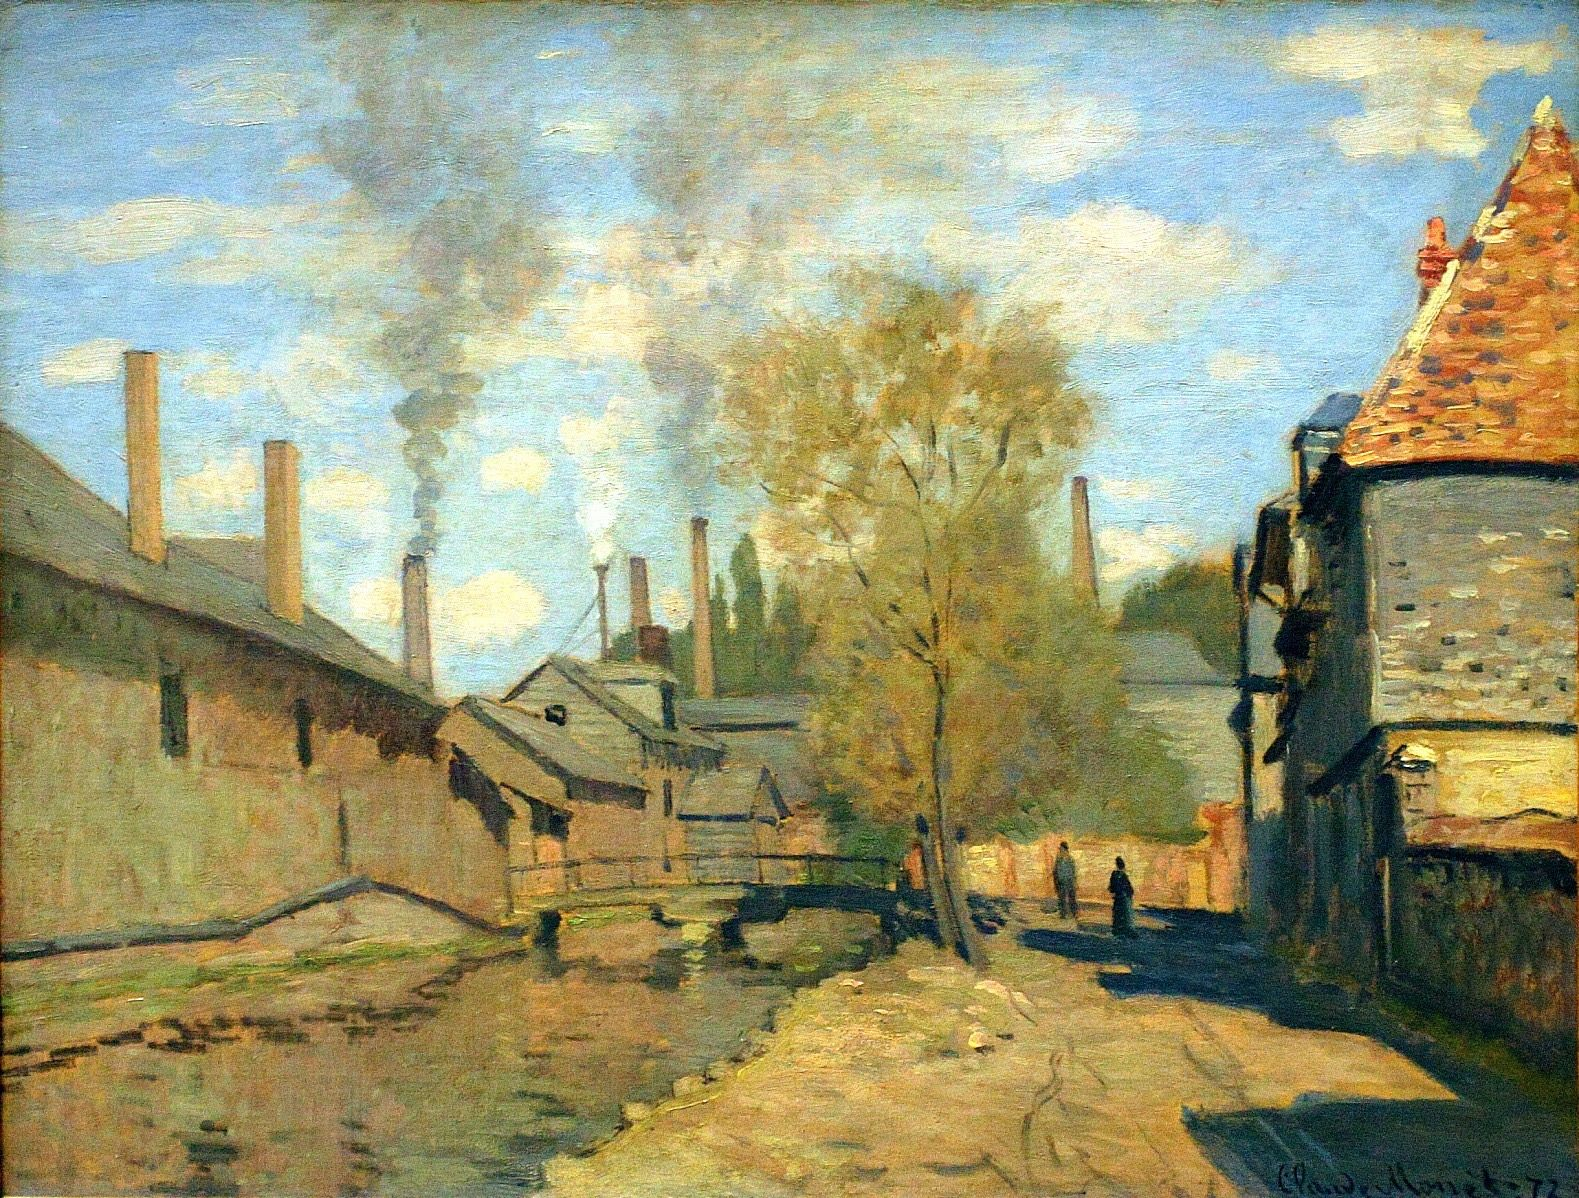 The Stream of Robec, Rouen, 1872 Claude Monet | Artist monet, Monet, Claude  monet